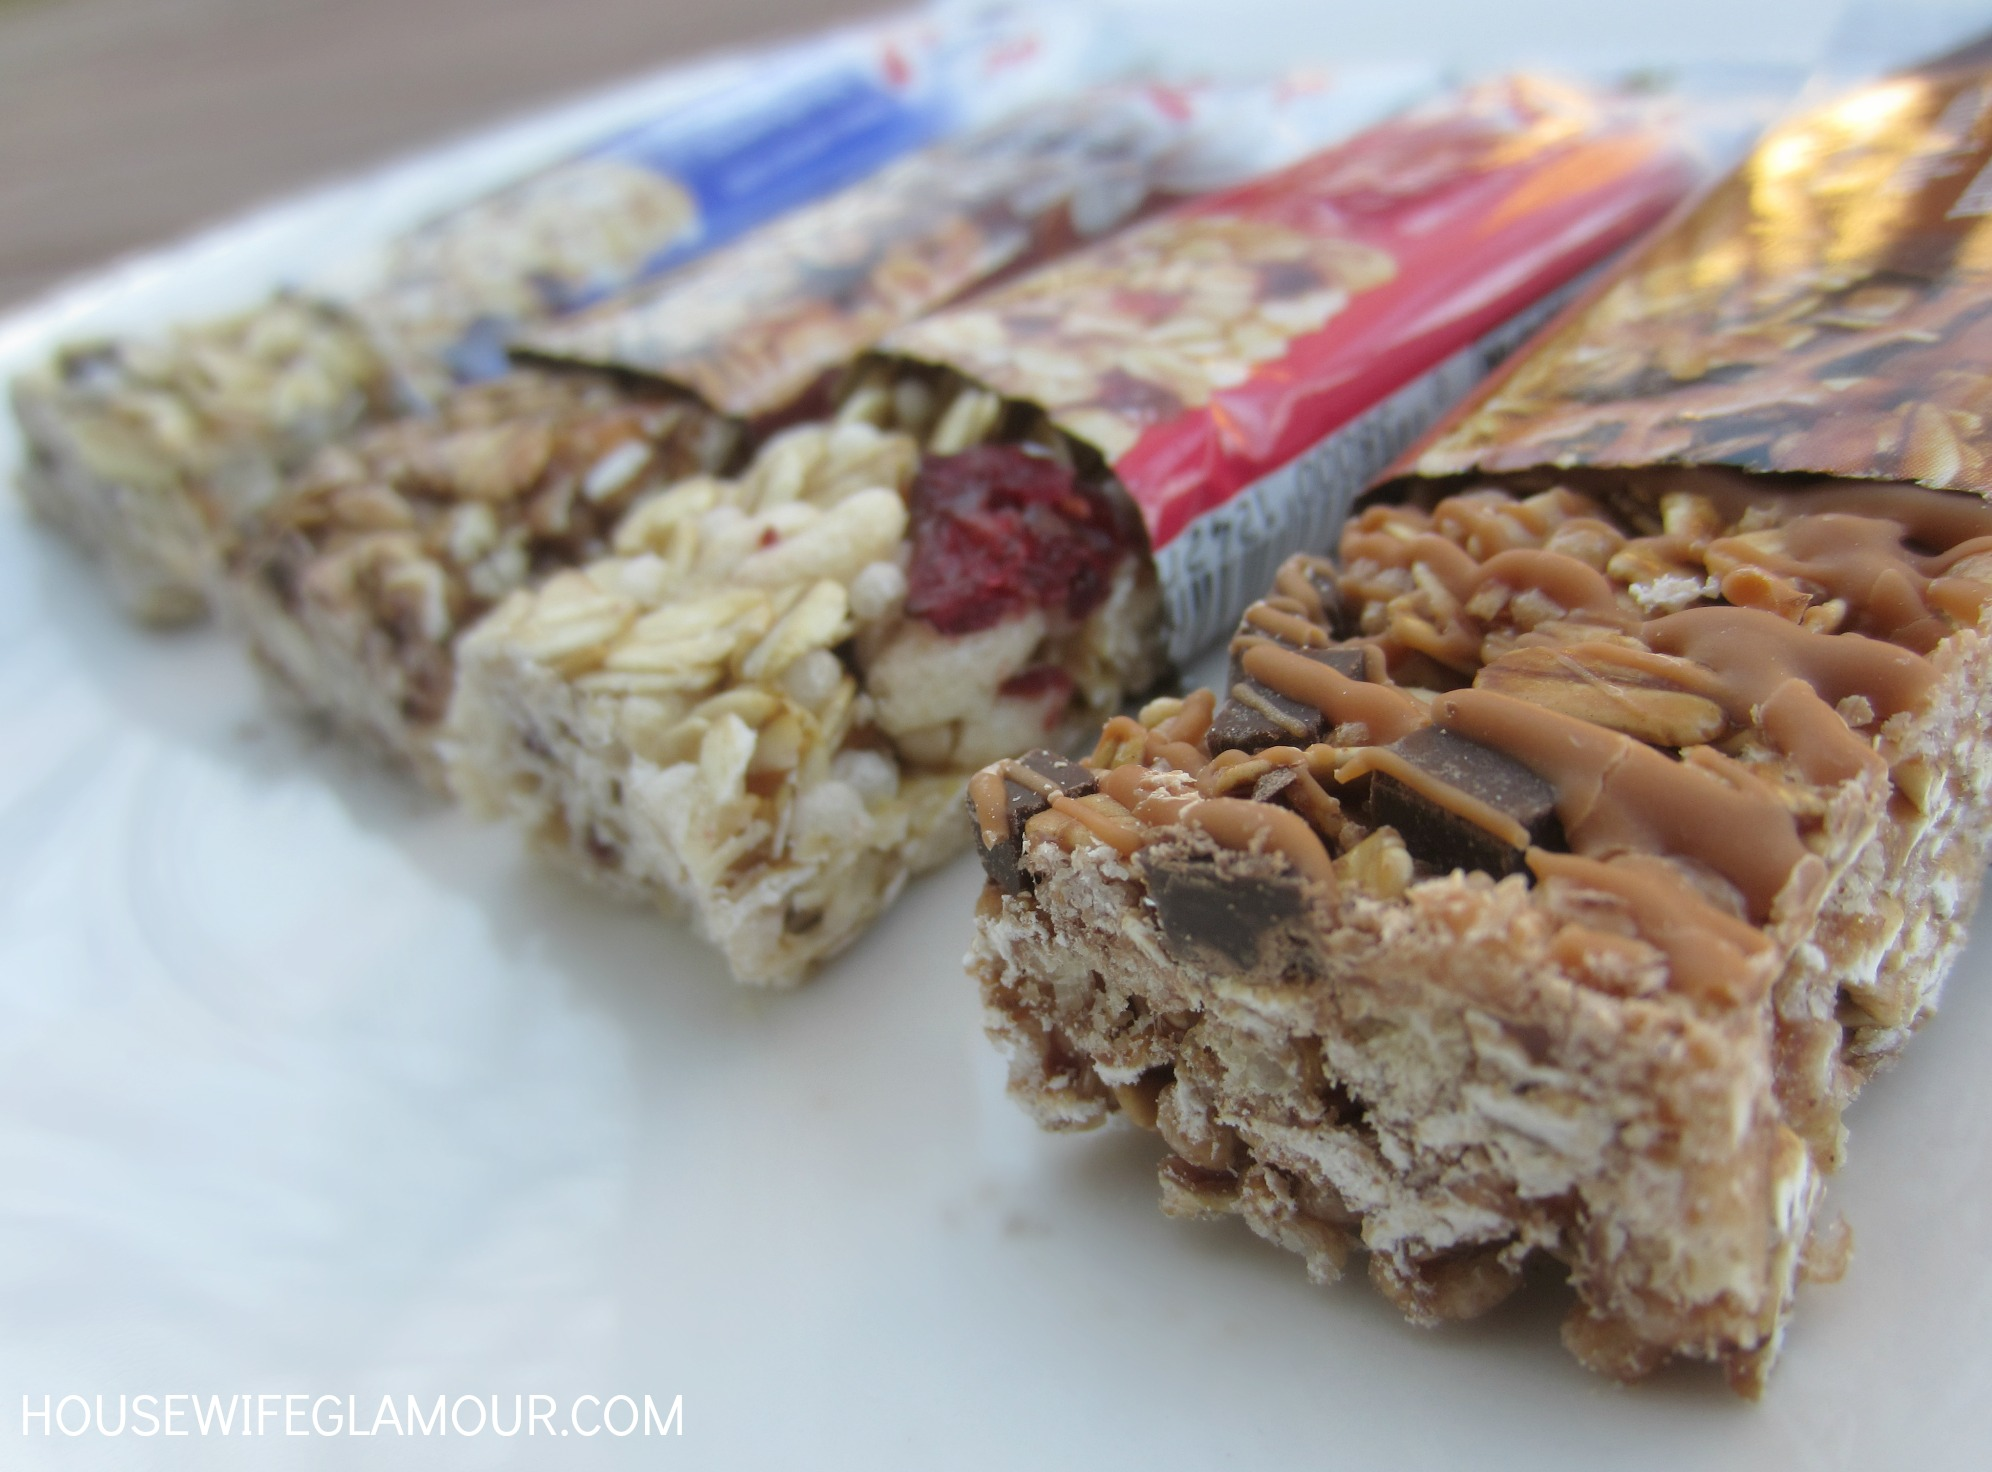 new special k snack bars